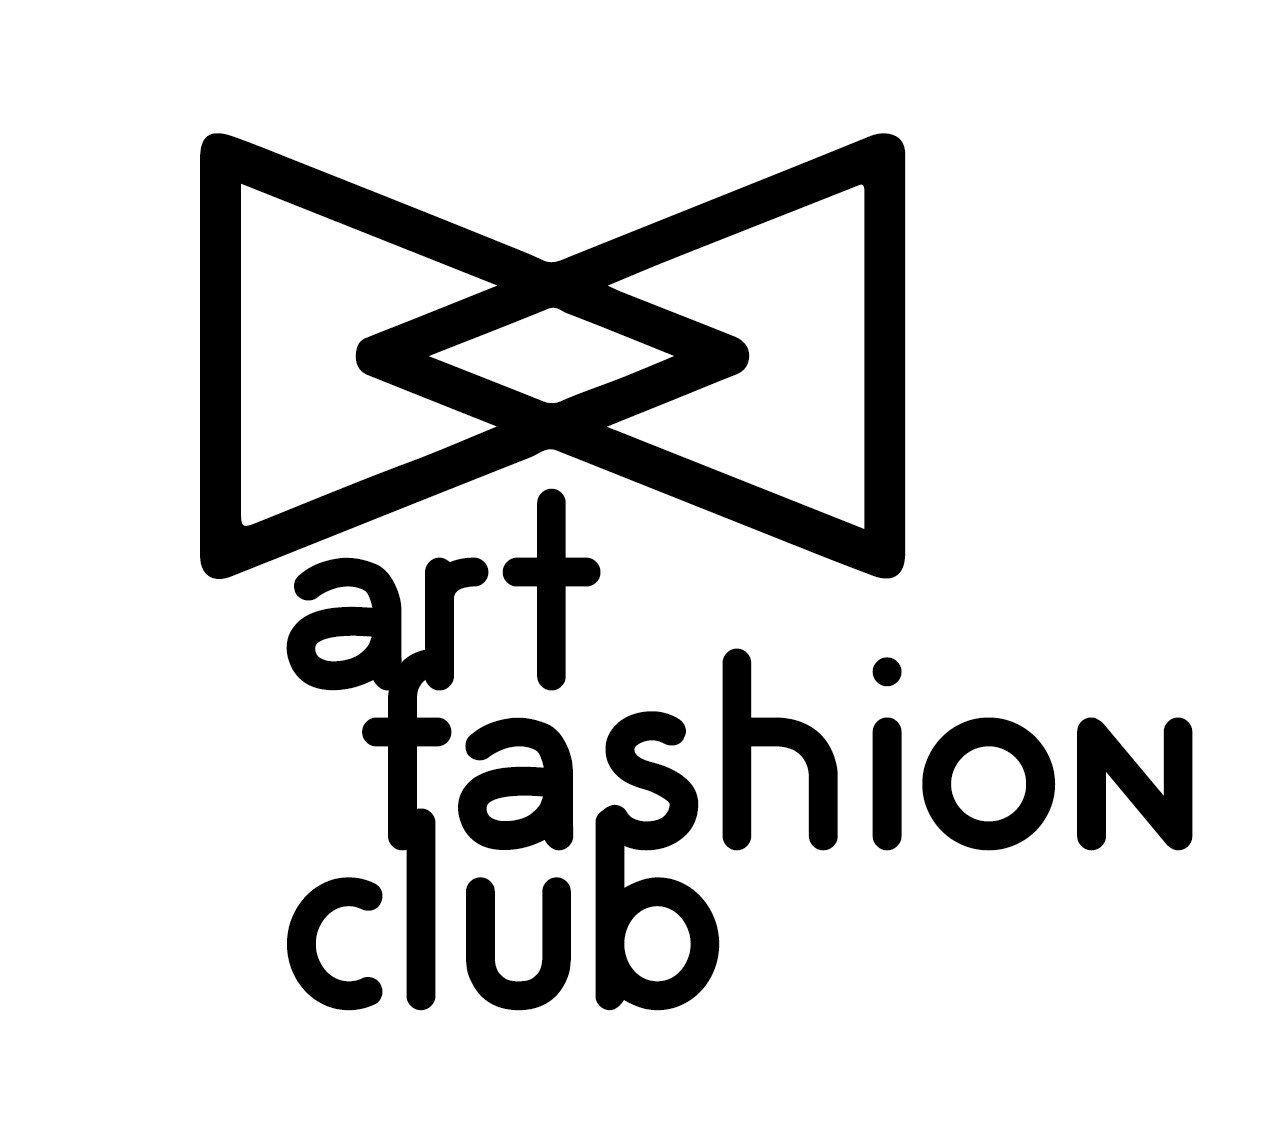 выставка одежда ручная работа ярмарка